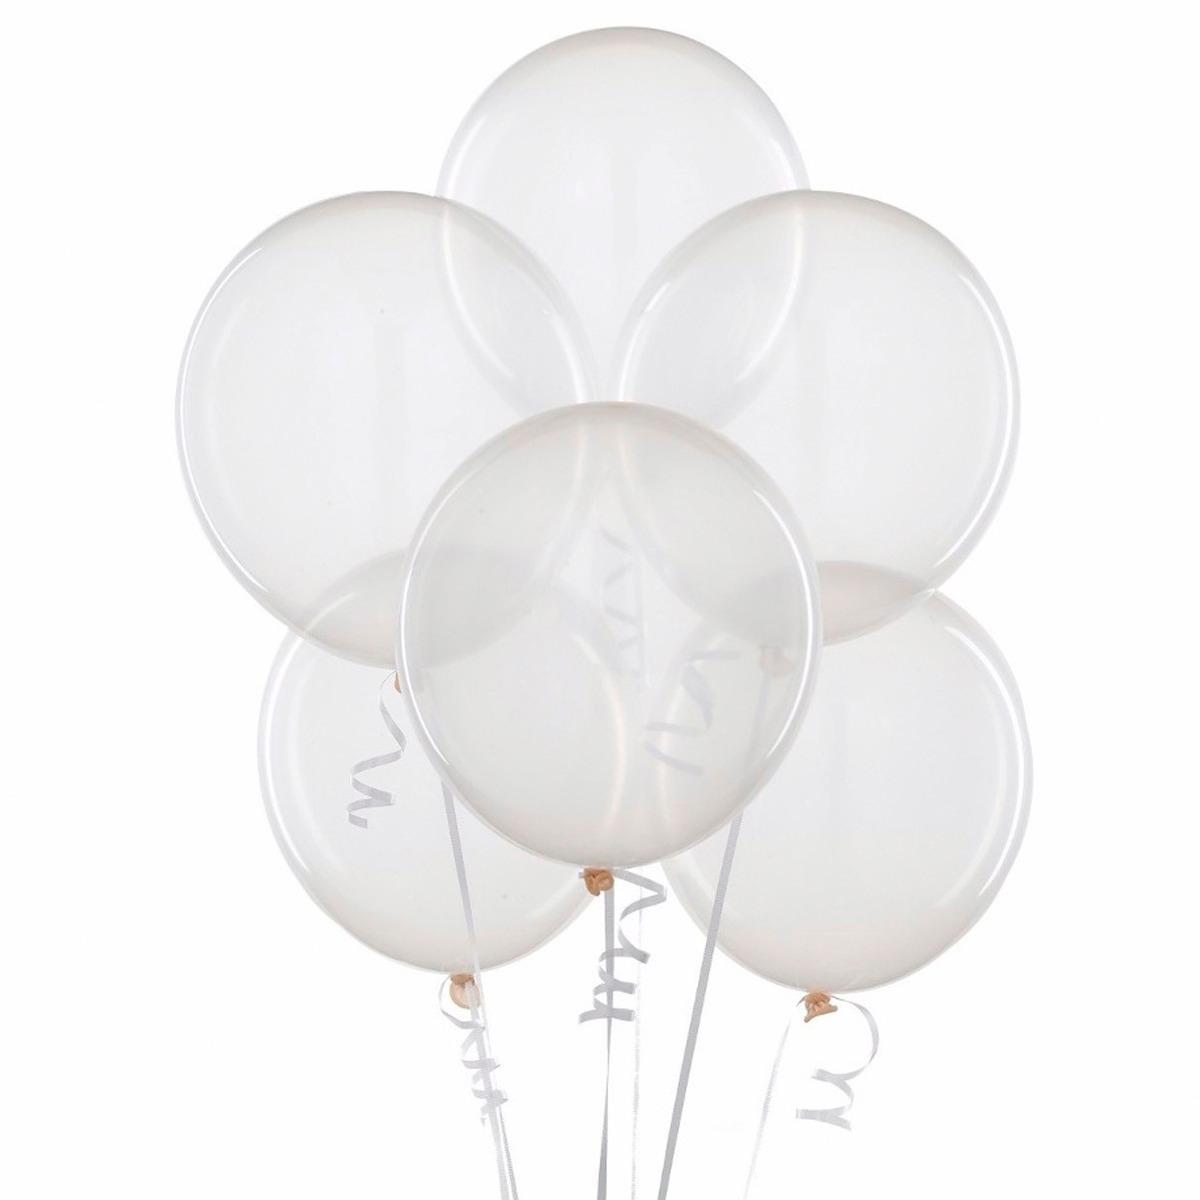 pack de 25 globos struffing cristal transparente r 18 fiestaclub